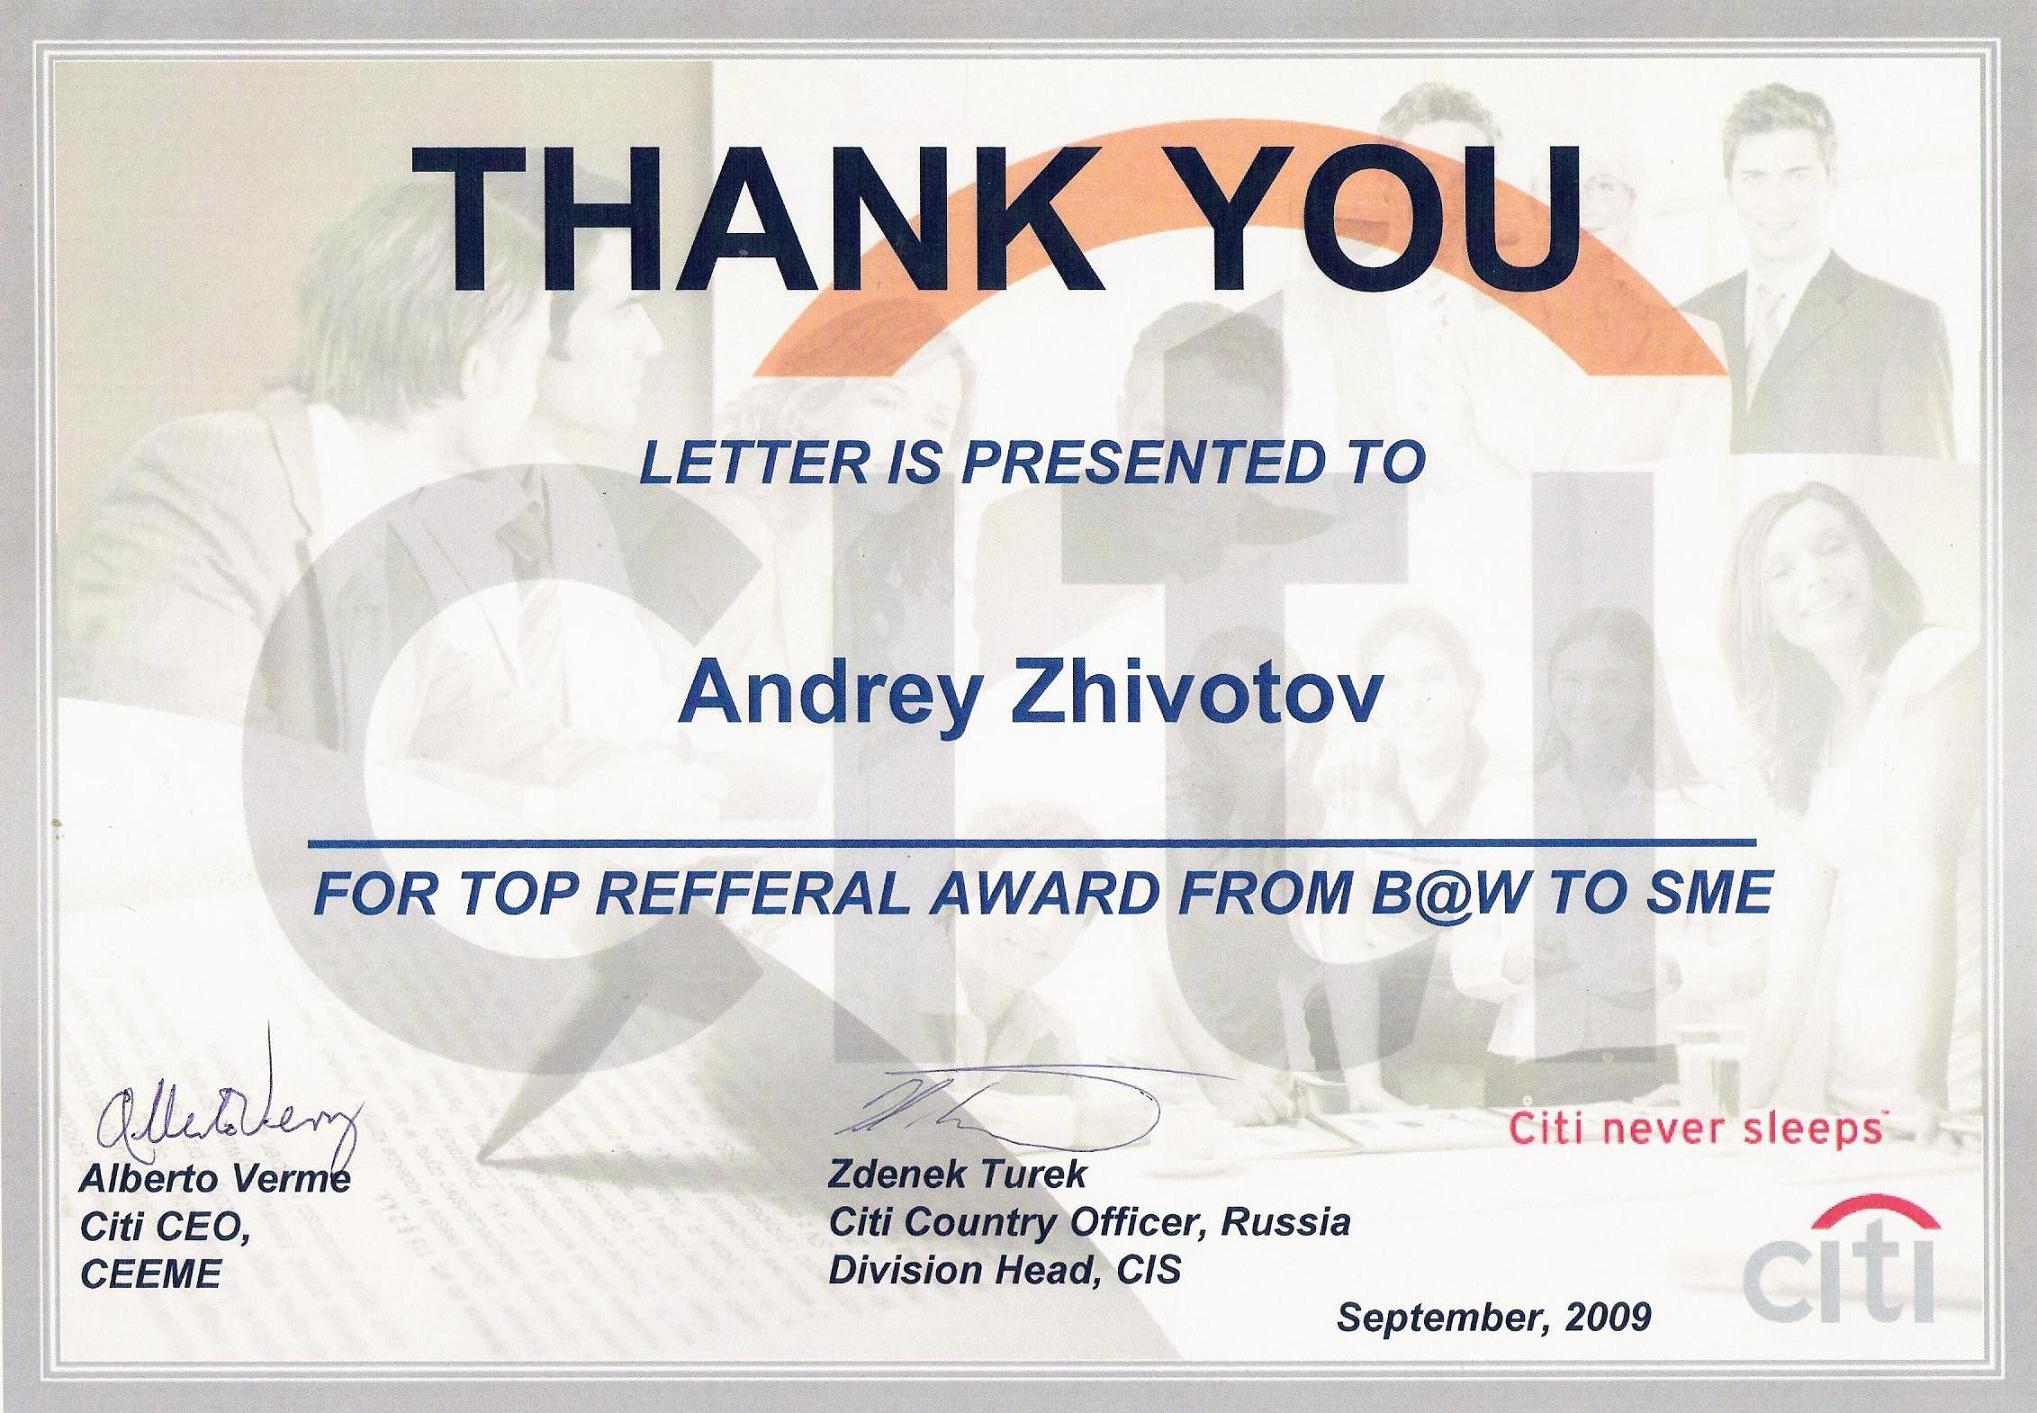 2009 Citibank Alberto Verme Zdenek Turek